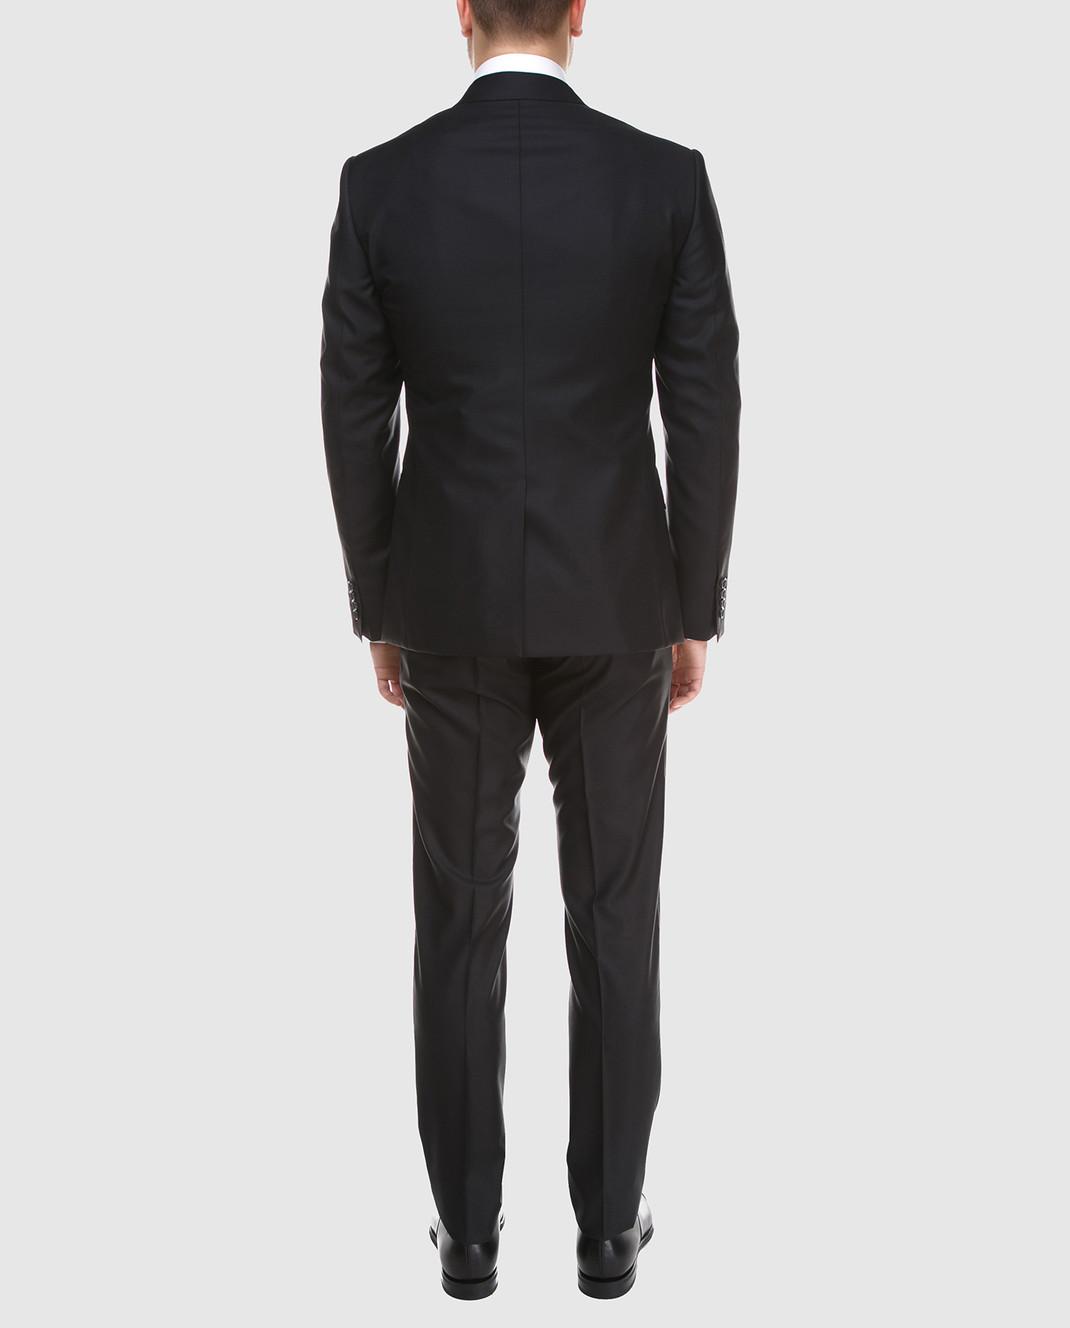 Dolce&Gabbana Черный костюм GK0RMTFU3N0 изображение 4